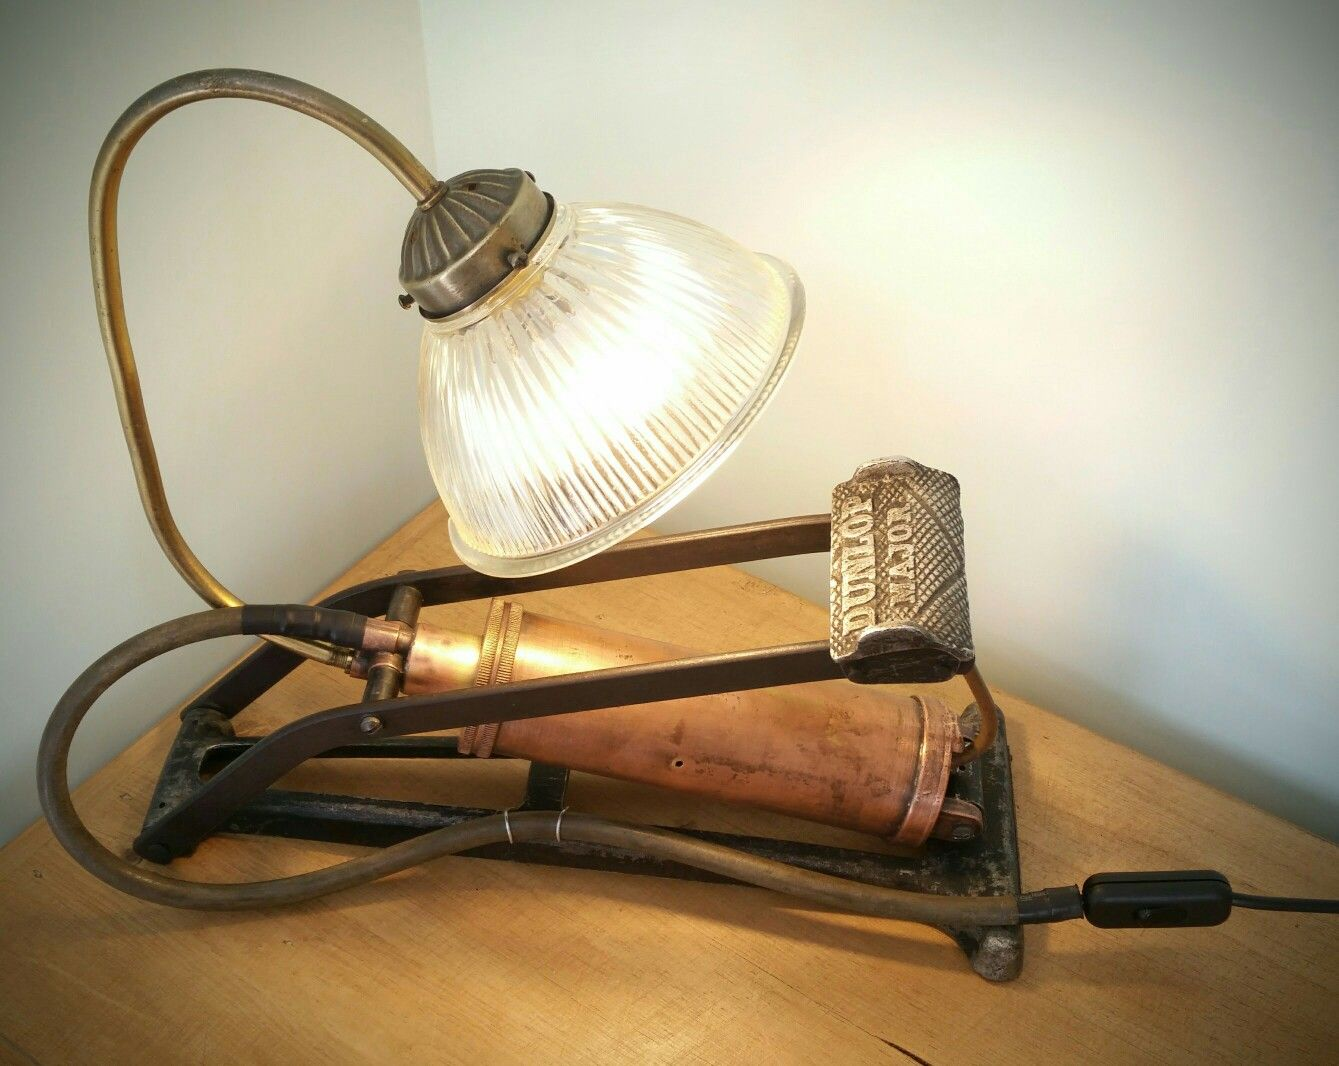 Pump Dunlop Lampsteampunk IndustrialMig Amc77 Foot Major tsrhdxQC